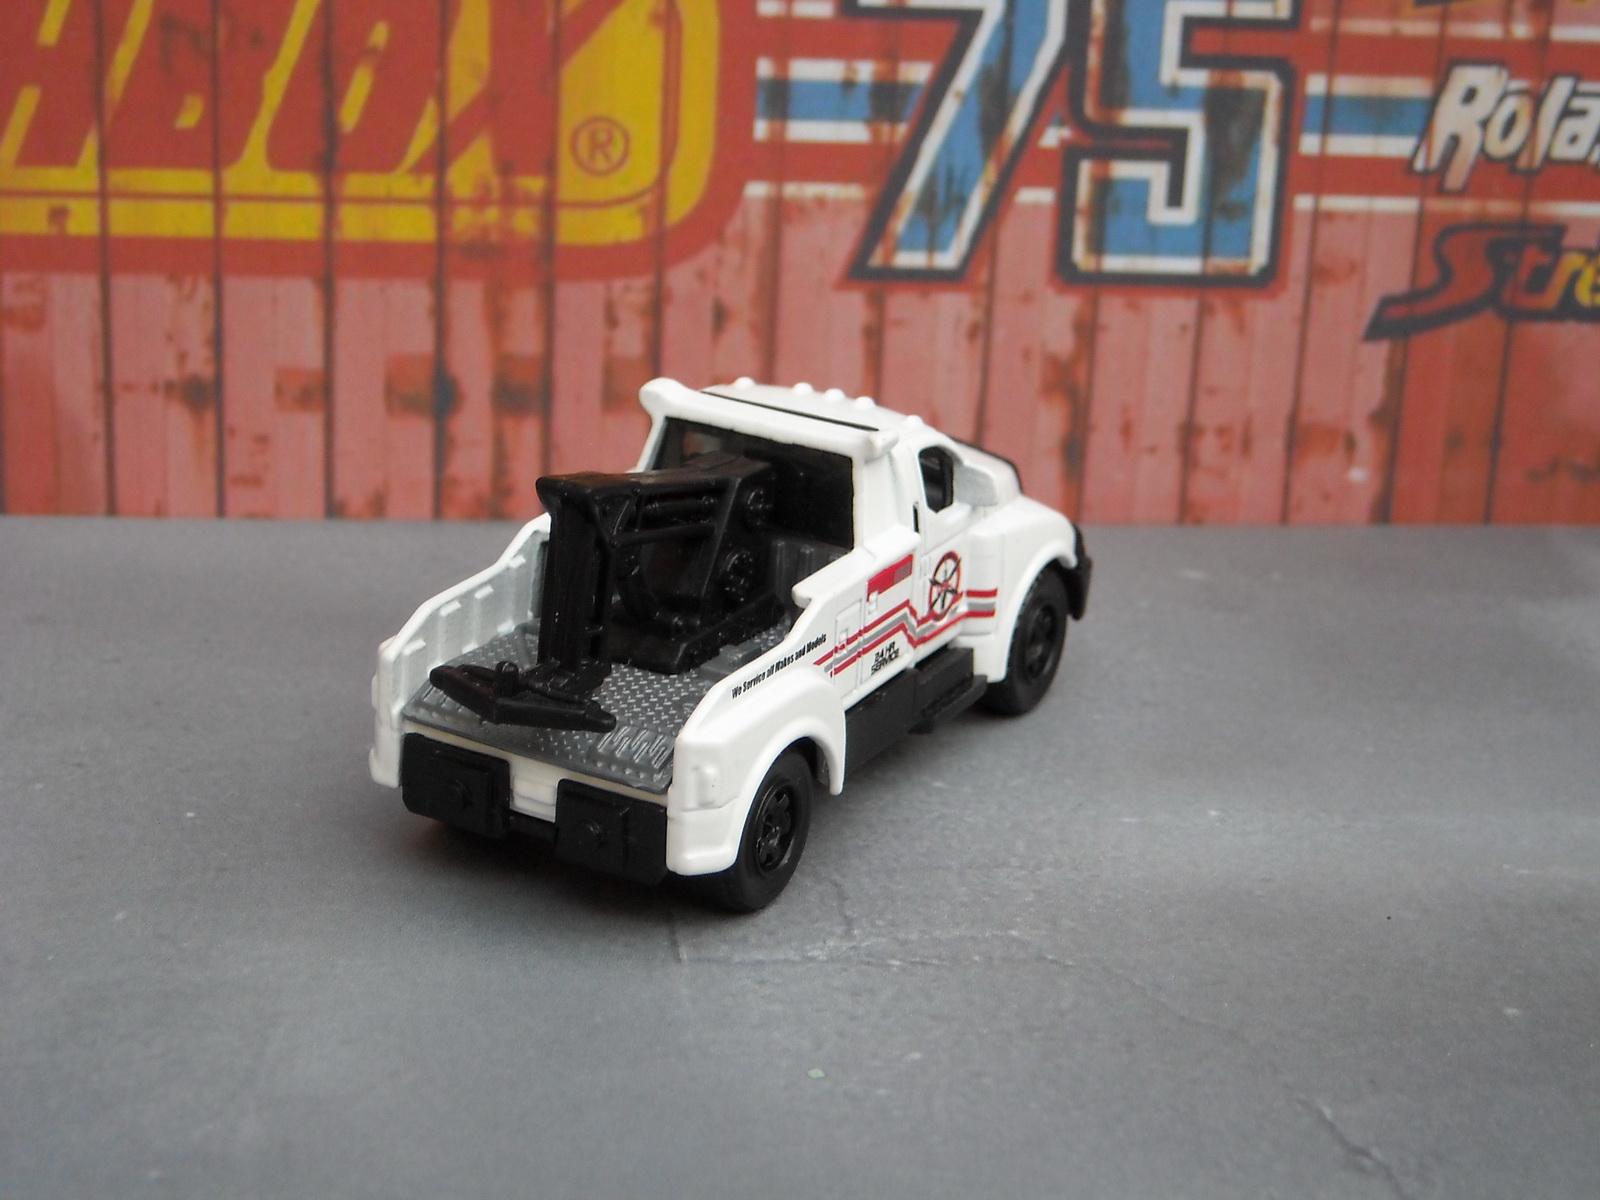 http://1.bp.blogspot.com/-dMo88i2eTWk/Tkq4NXGXM0I/AAAAAAAADsI/3s56WVVBsoM/s1600/matchbox_tow_truck_5.JPG